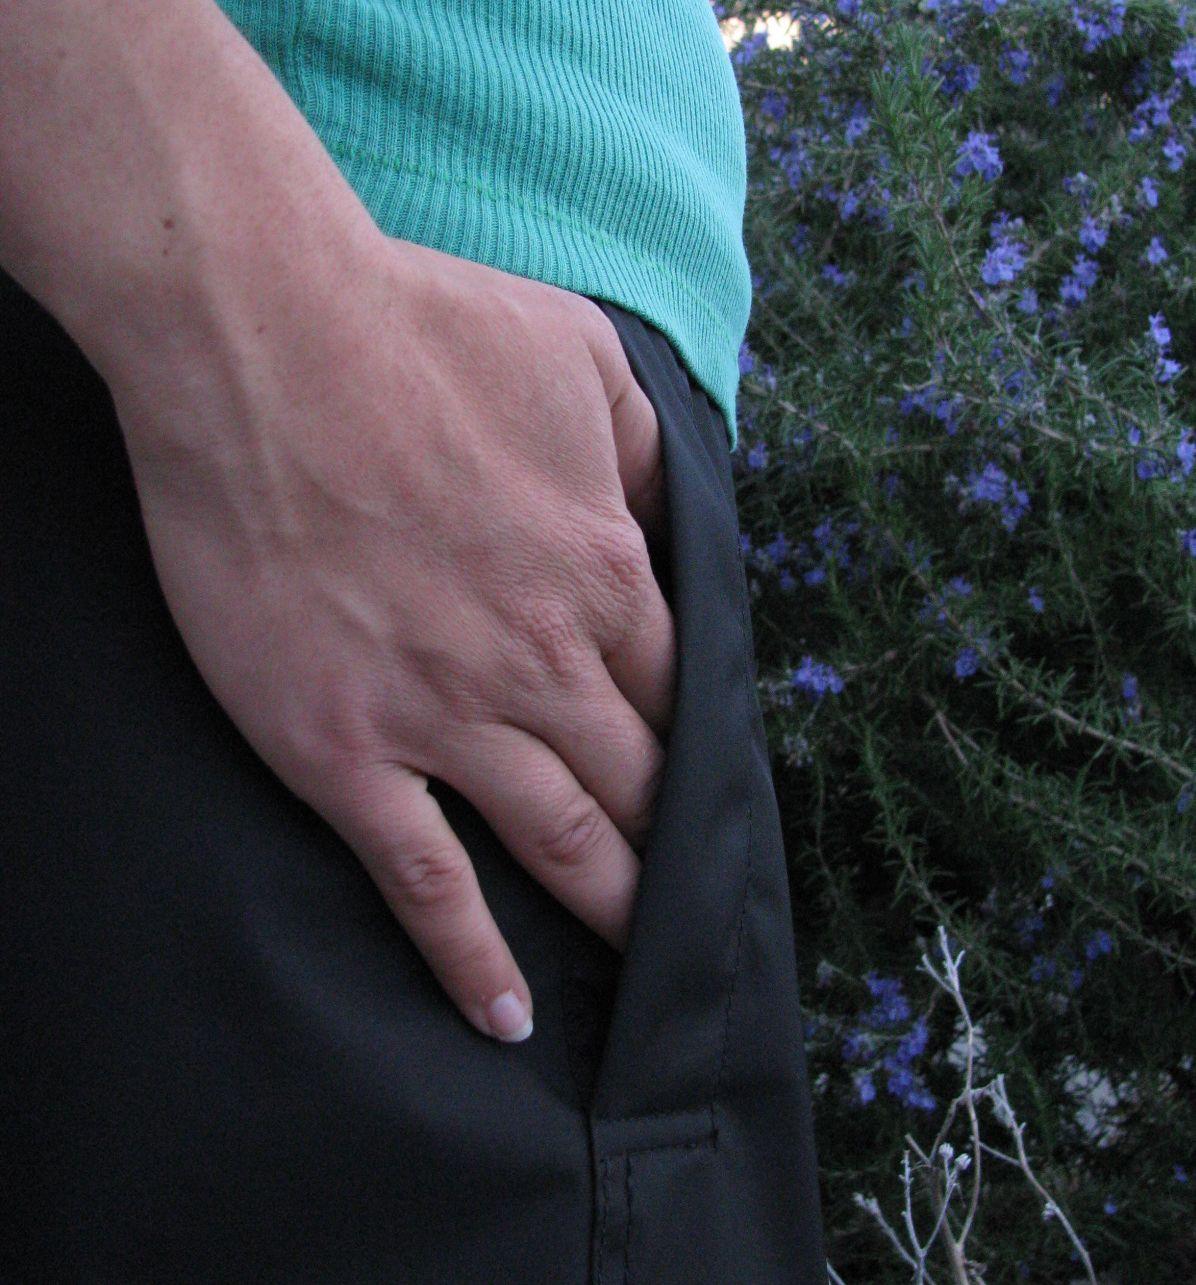 hand_into_pocket.jpg